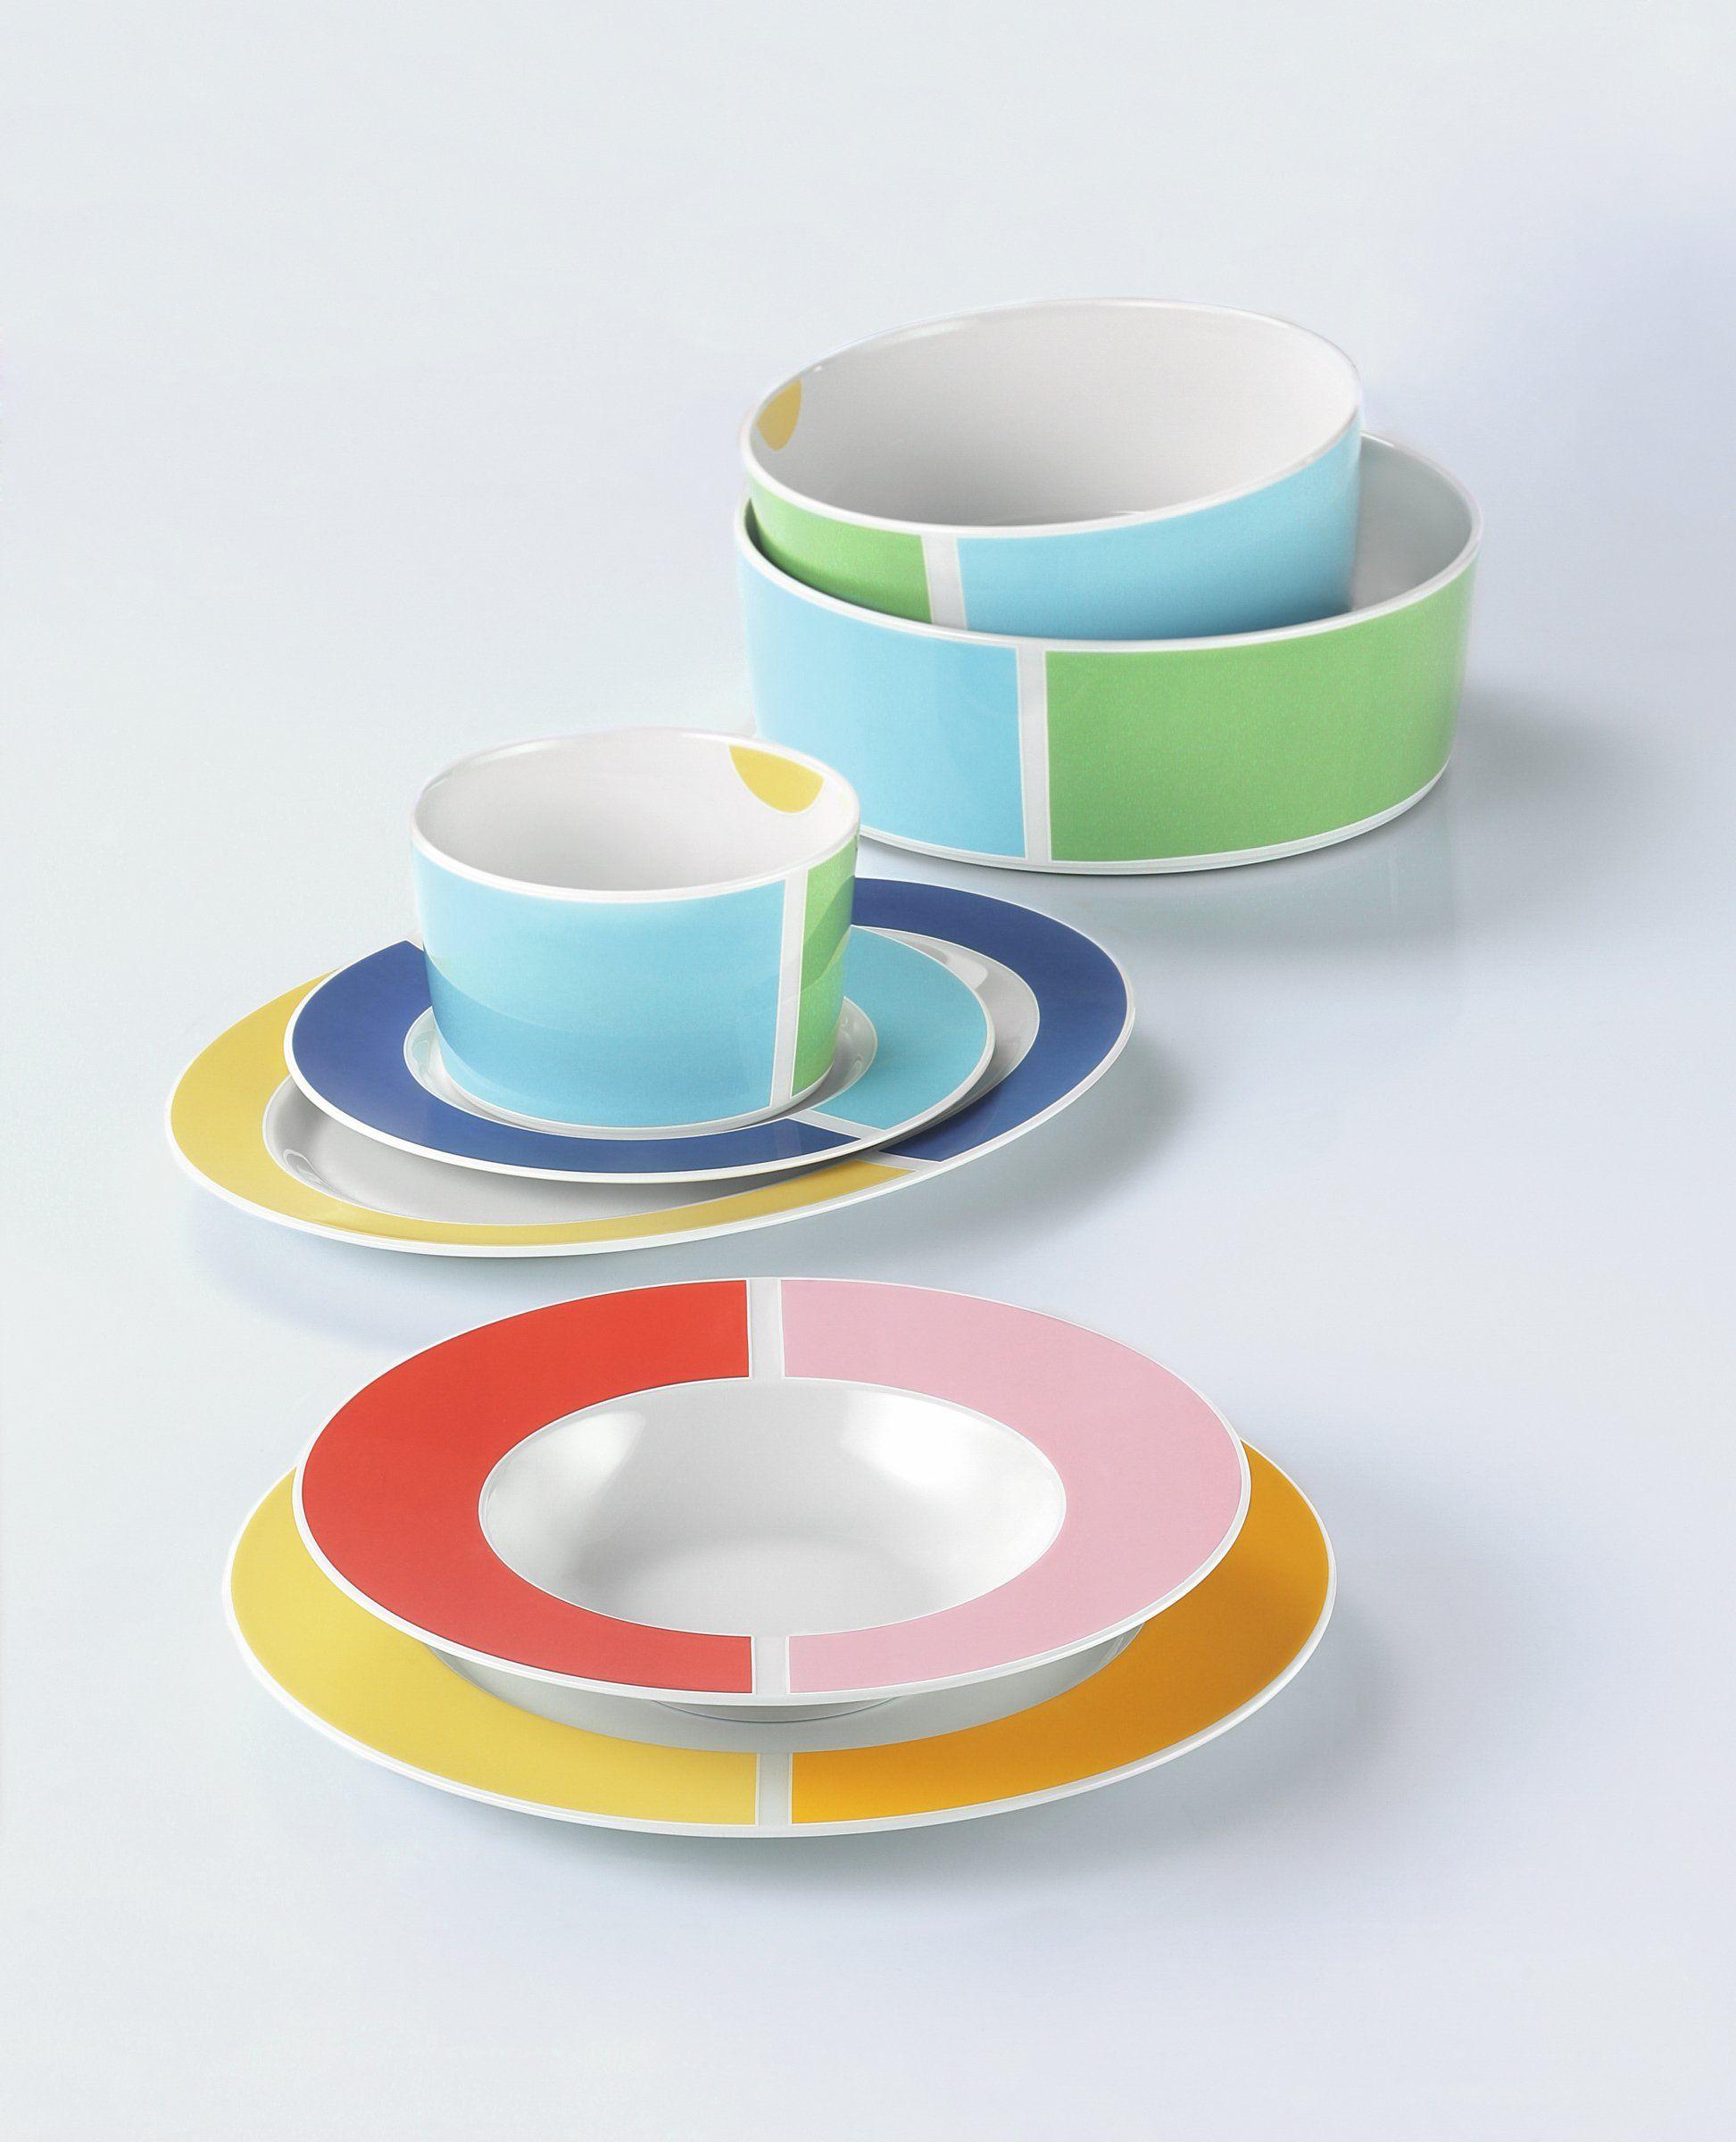 dinner set 16 nl no limits colors 24599 by Seltmann Weiden: Amazon ...